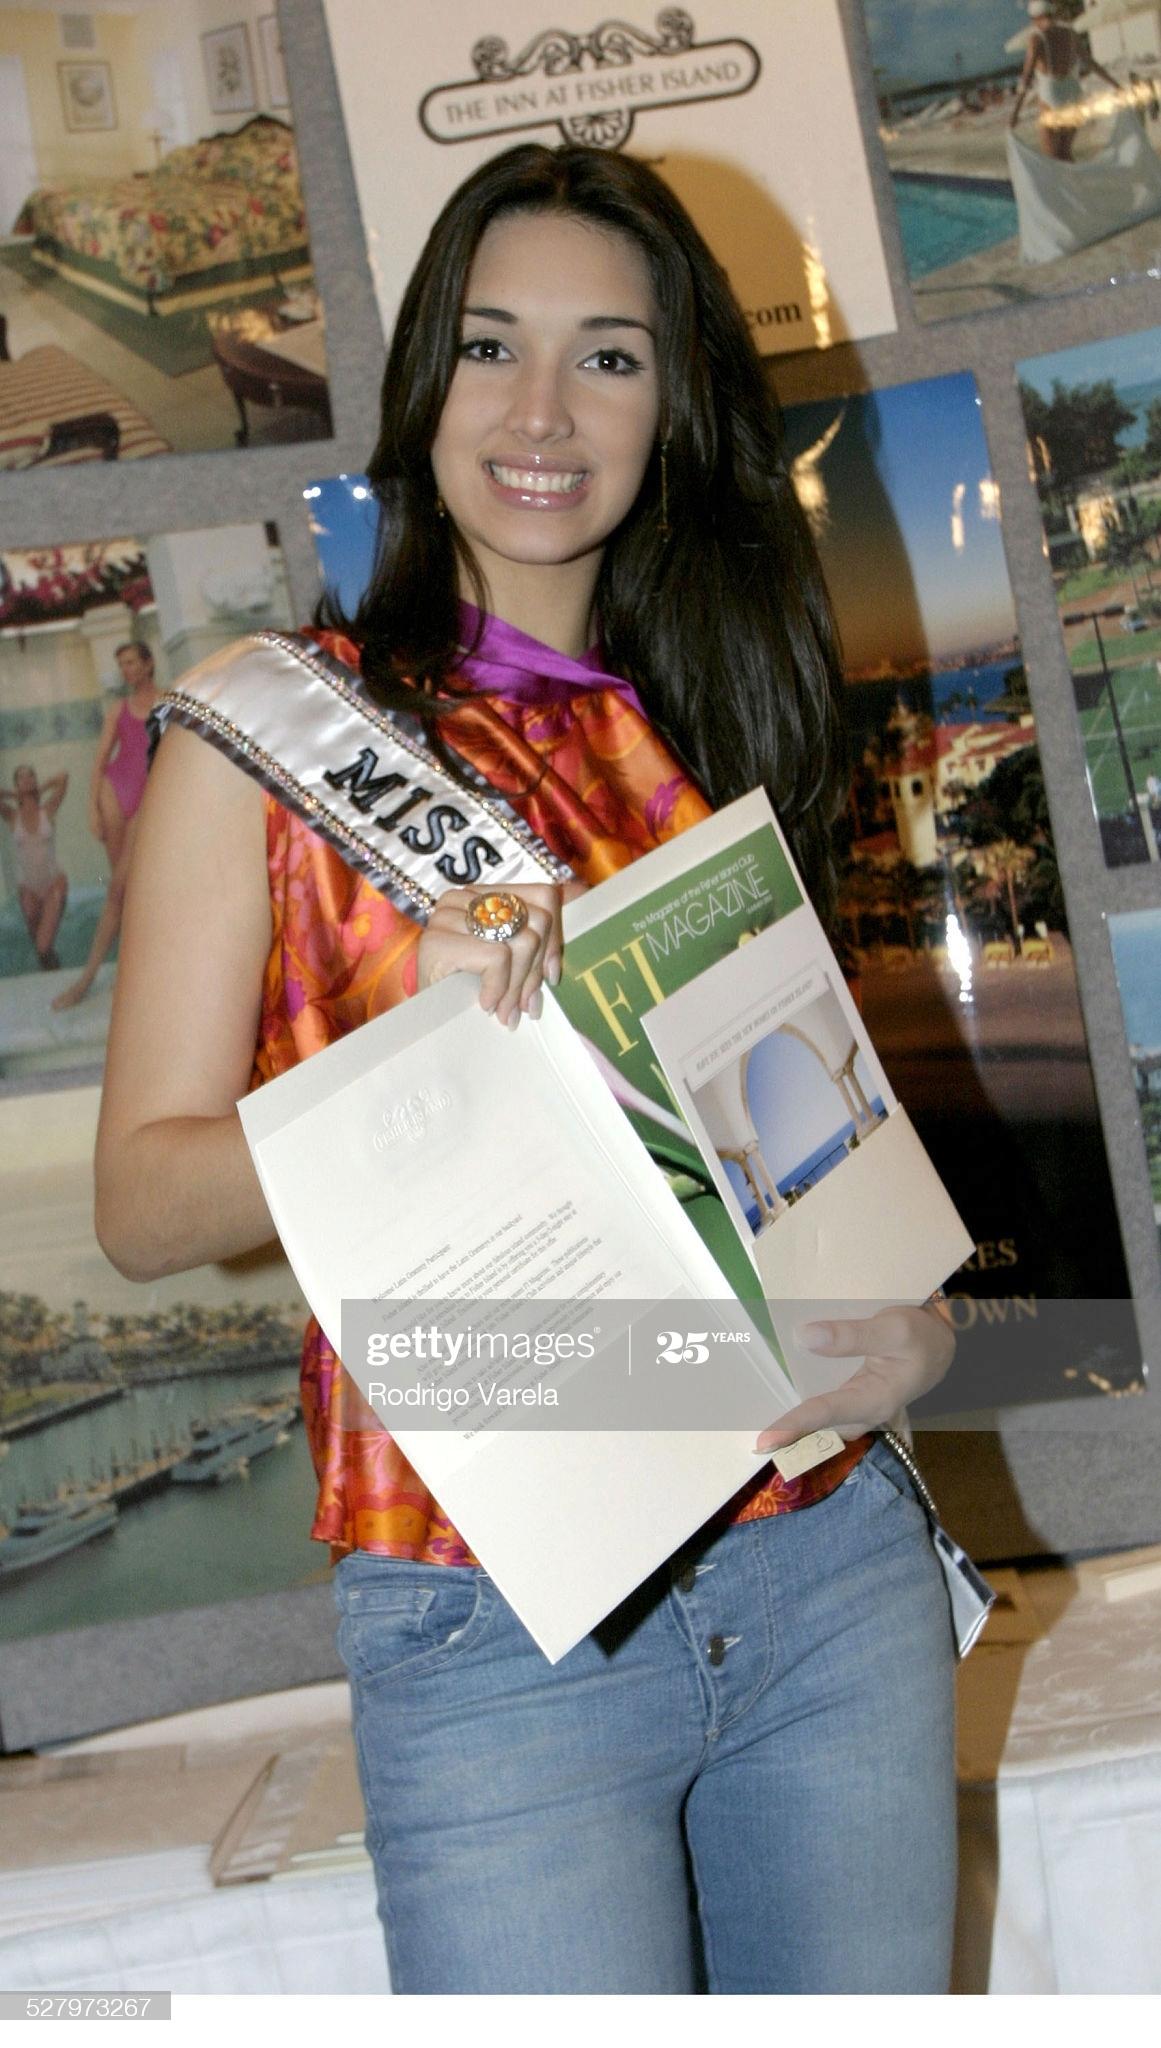 ════ ∘◦❁◦∘ ════ Amelia Vega, Miss Universe 2003. ════ ∘◦❁◦∘ ════ - Página 12 Miss-u56